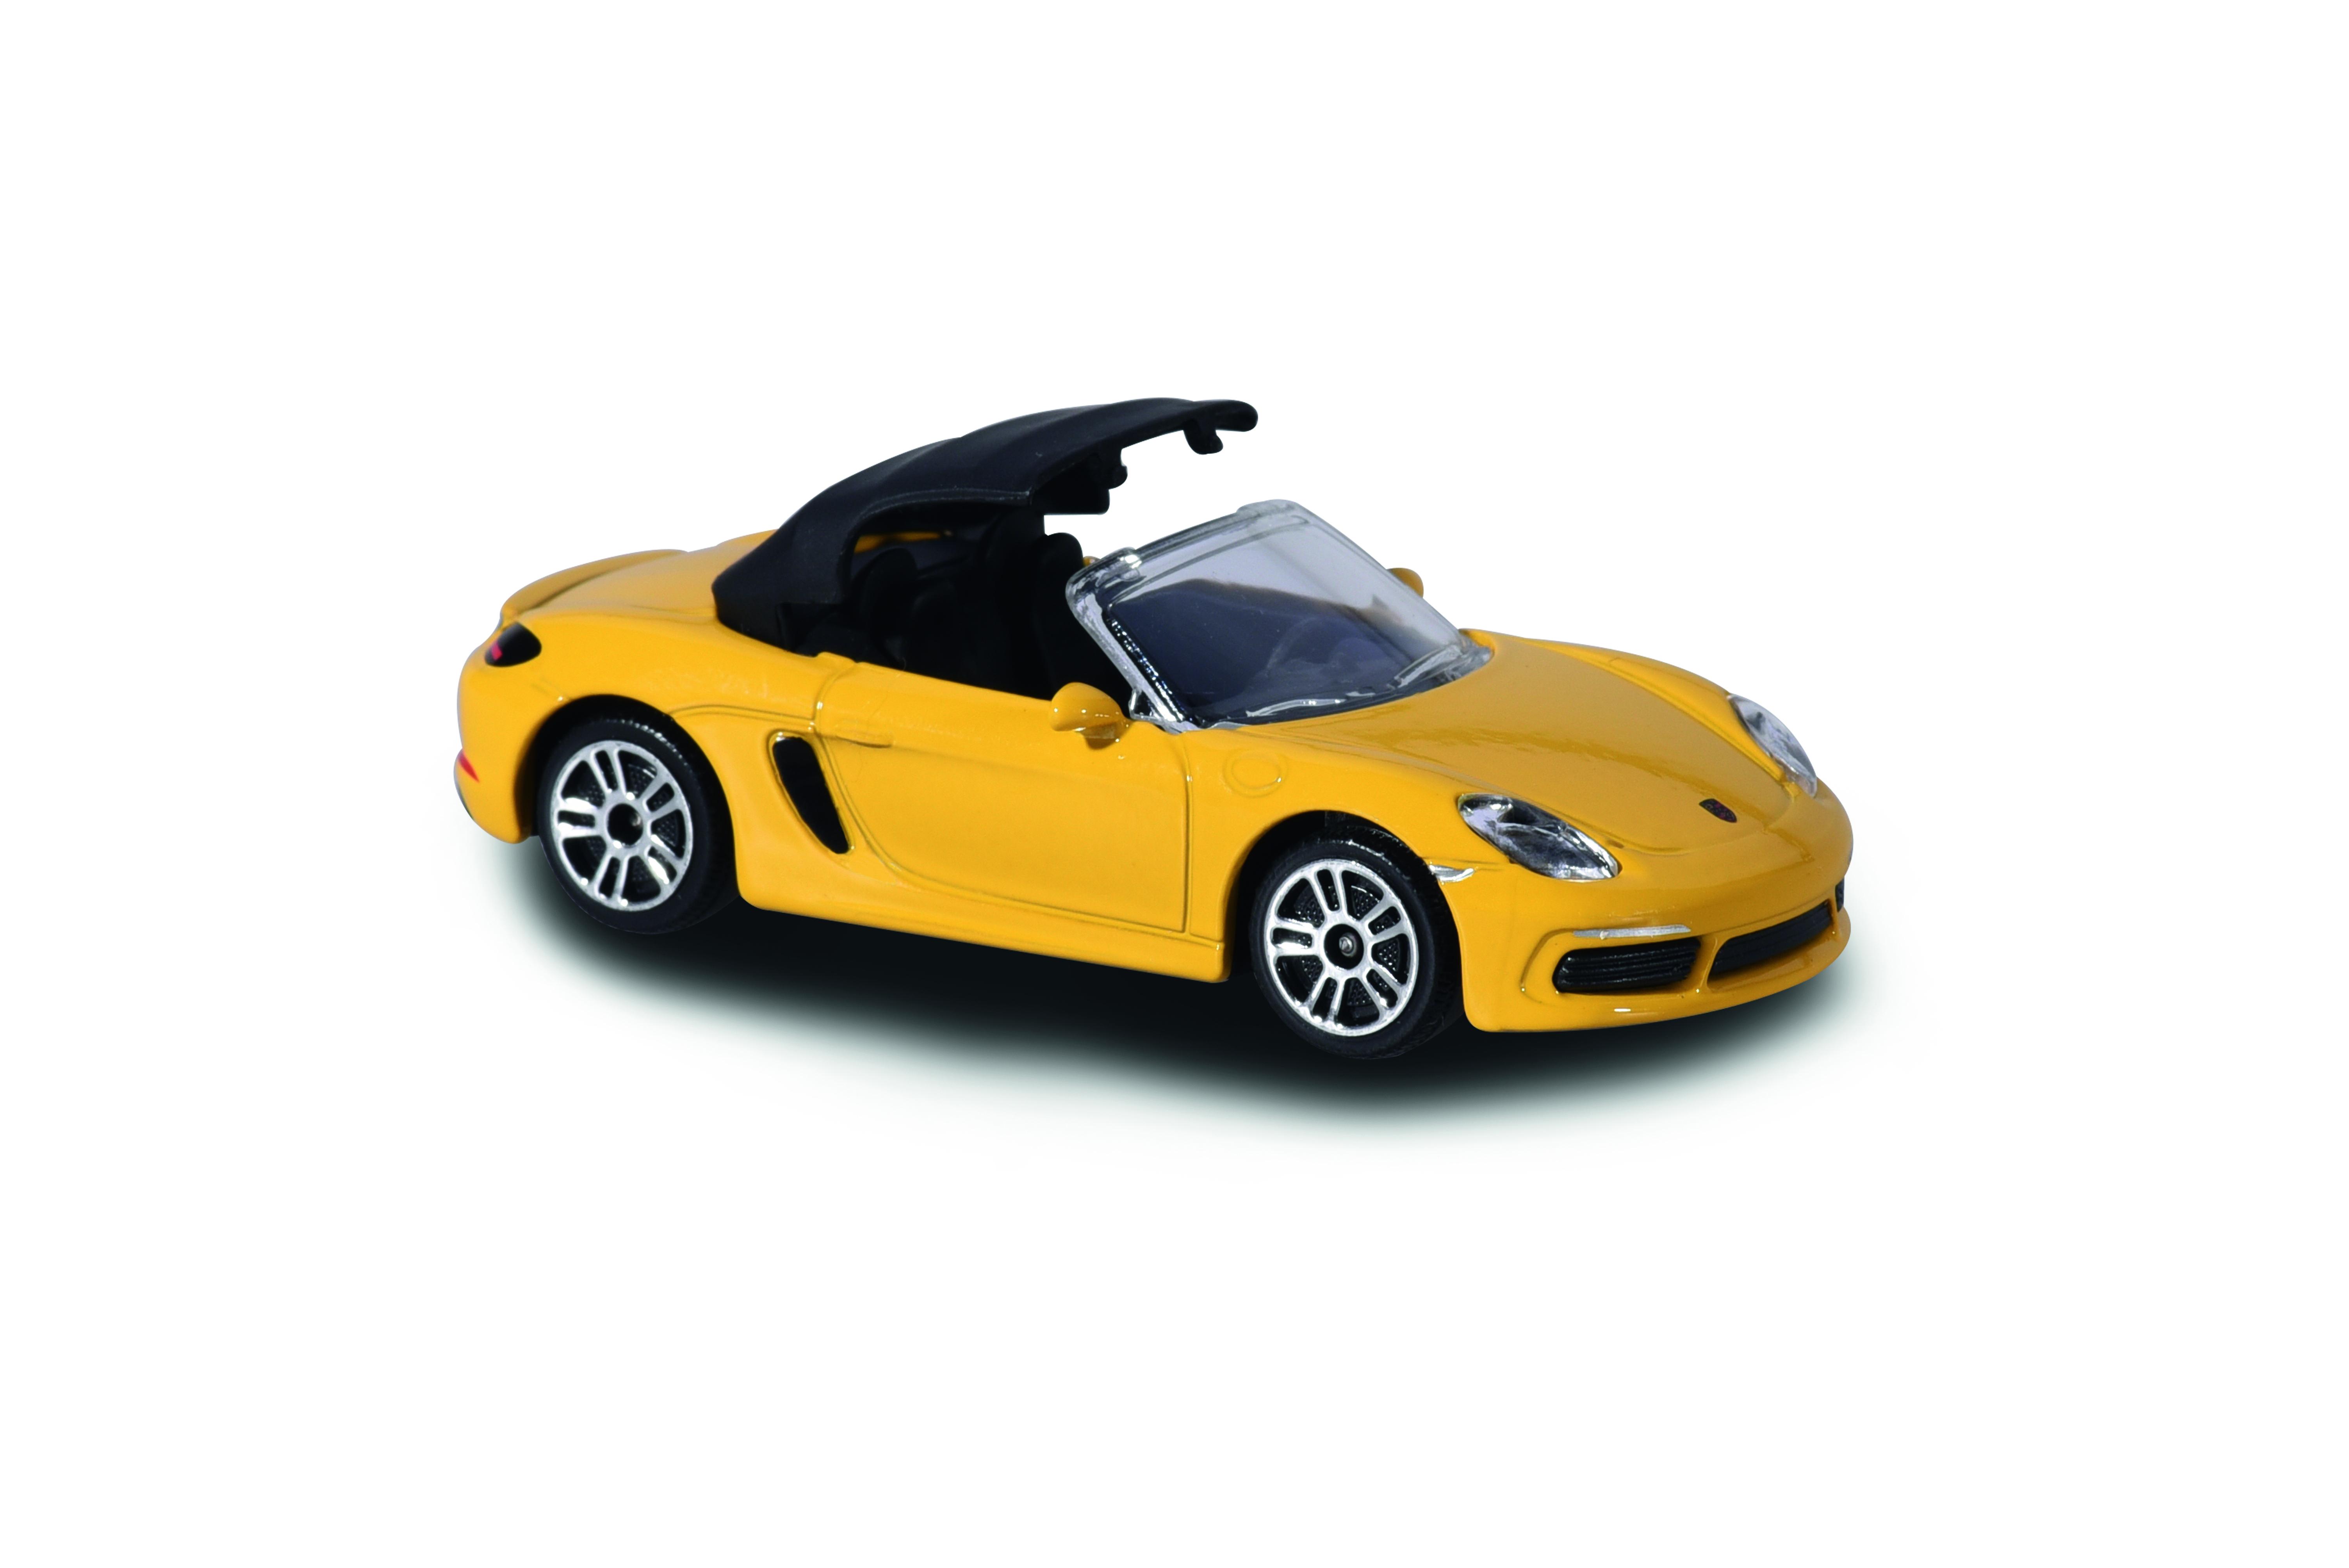 Porsche de Majorette